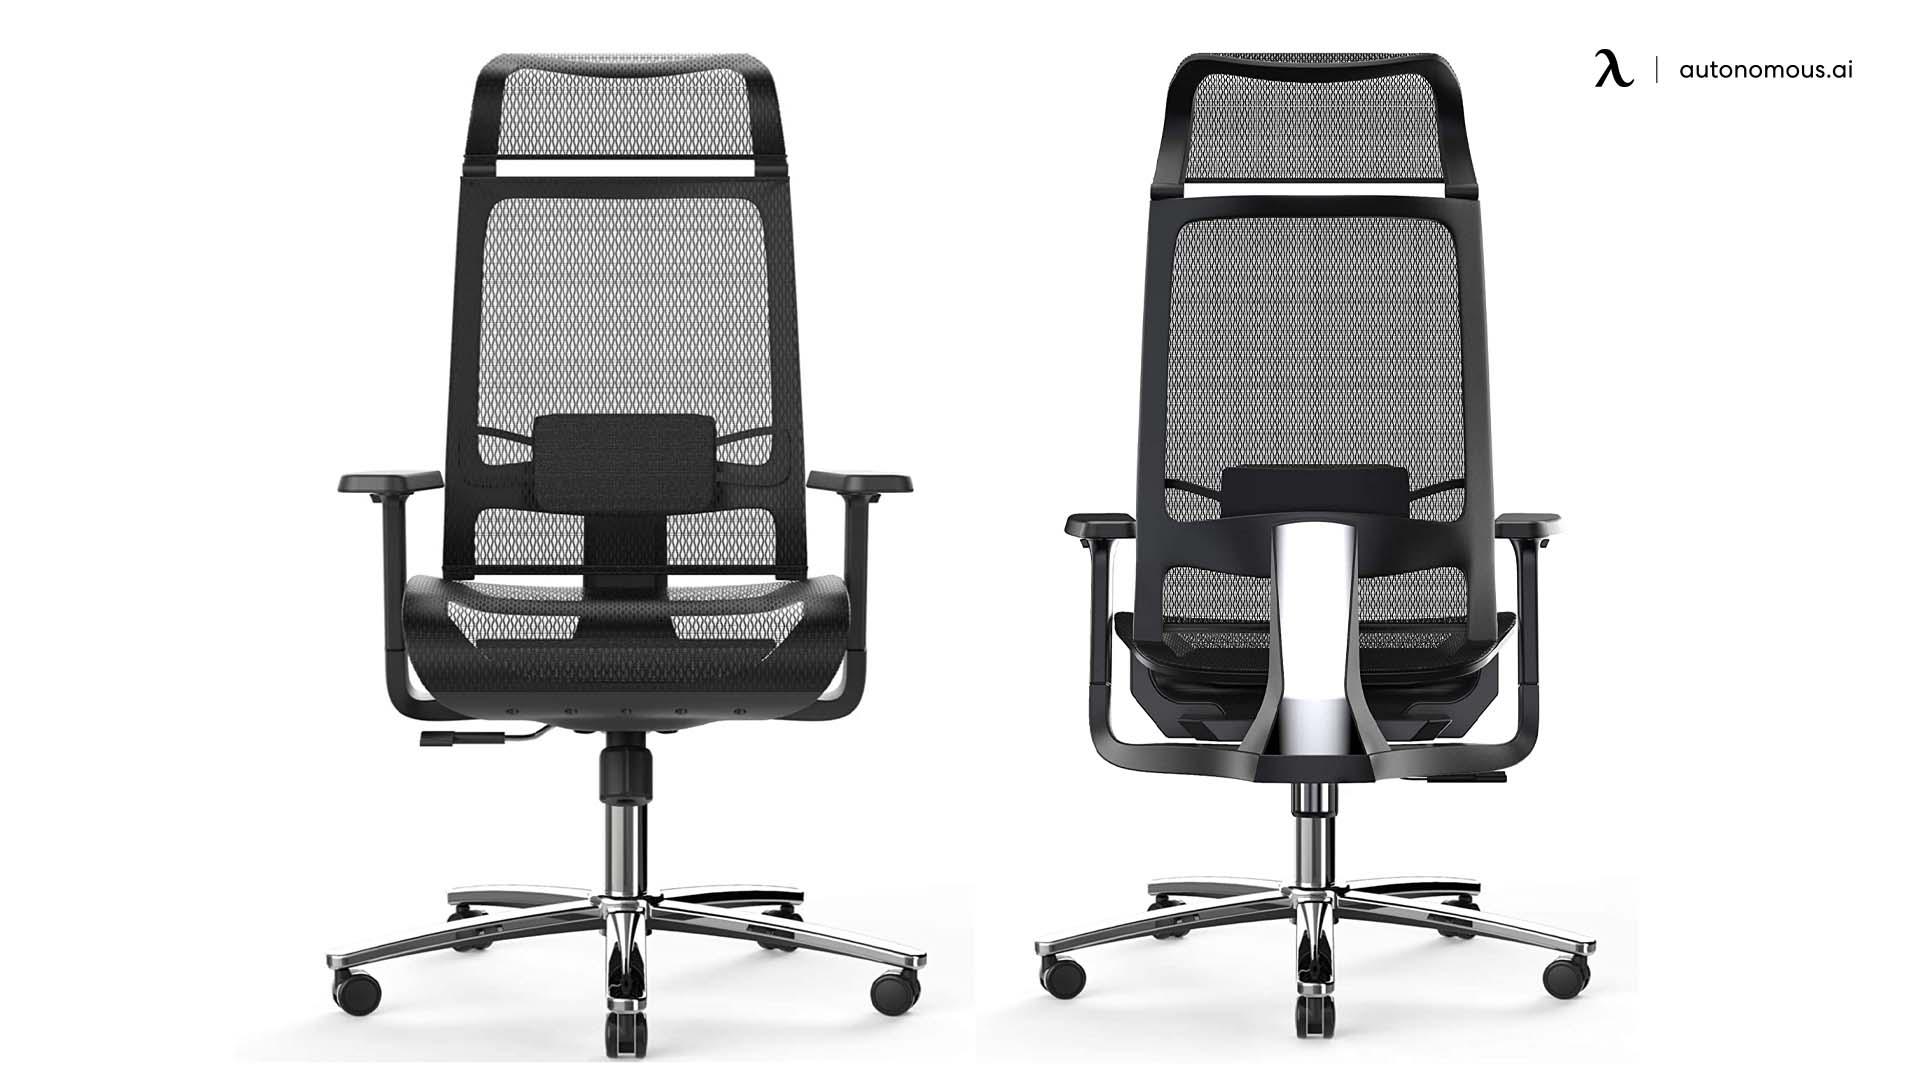 The Ergonomic Office Chair by Bilkoh